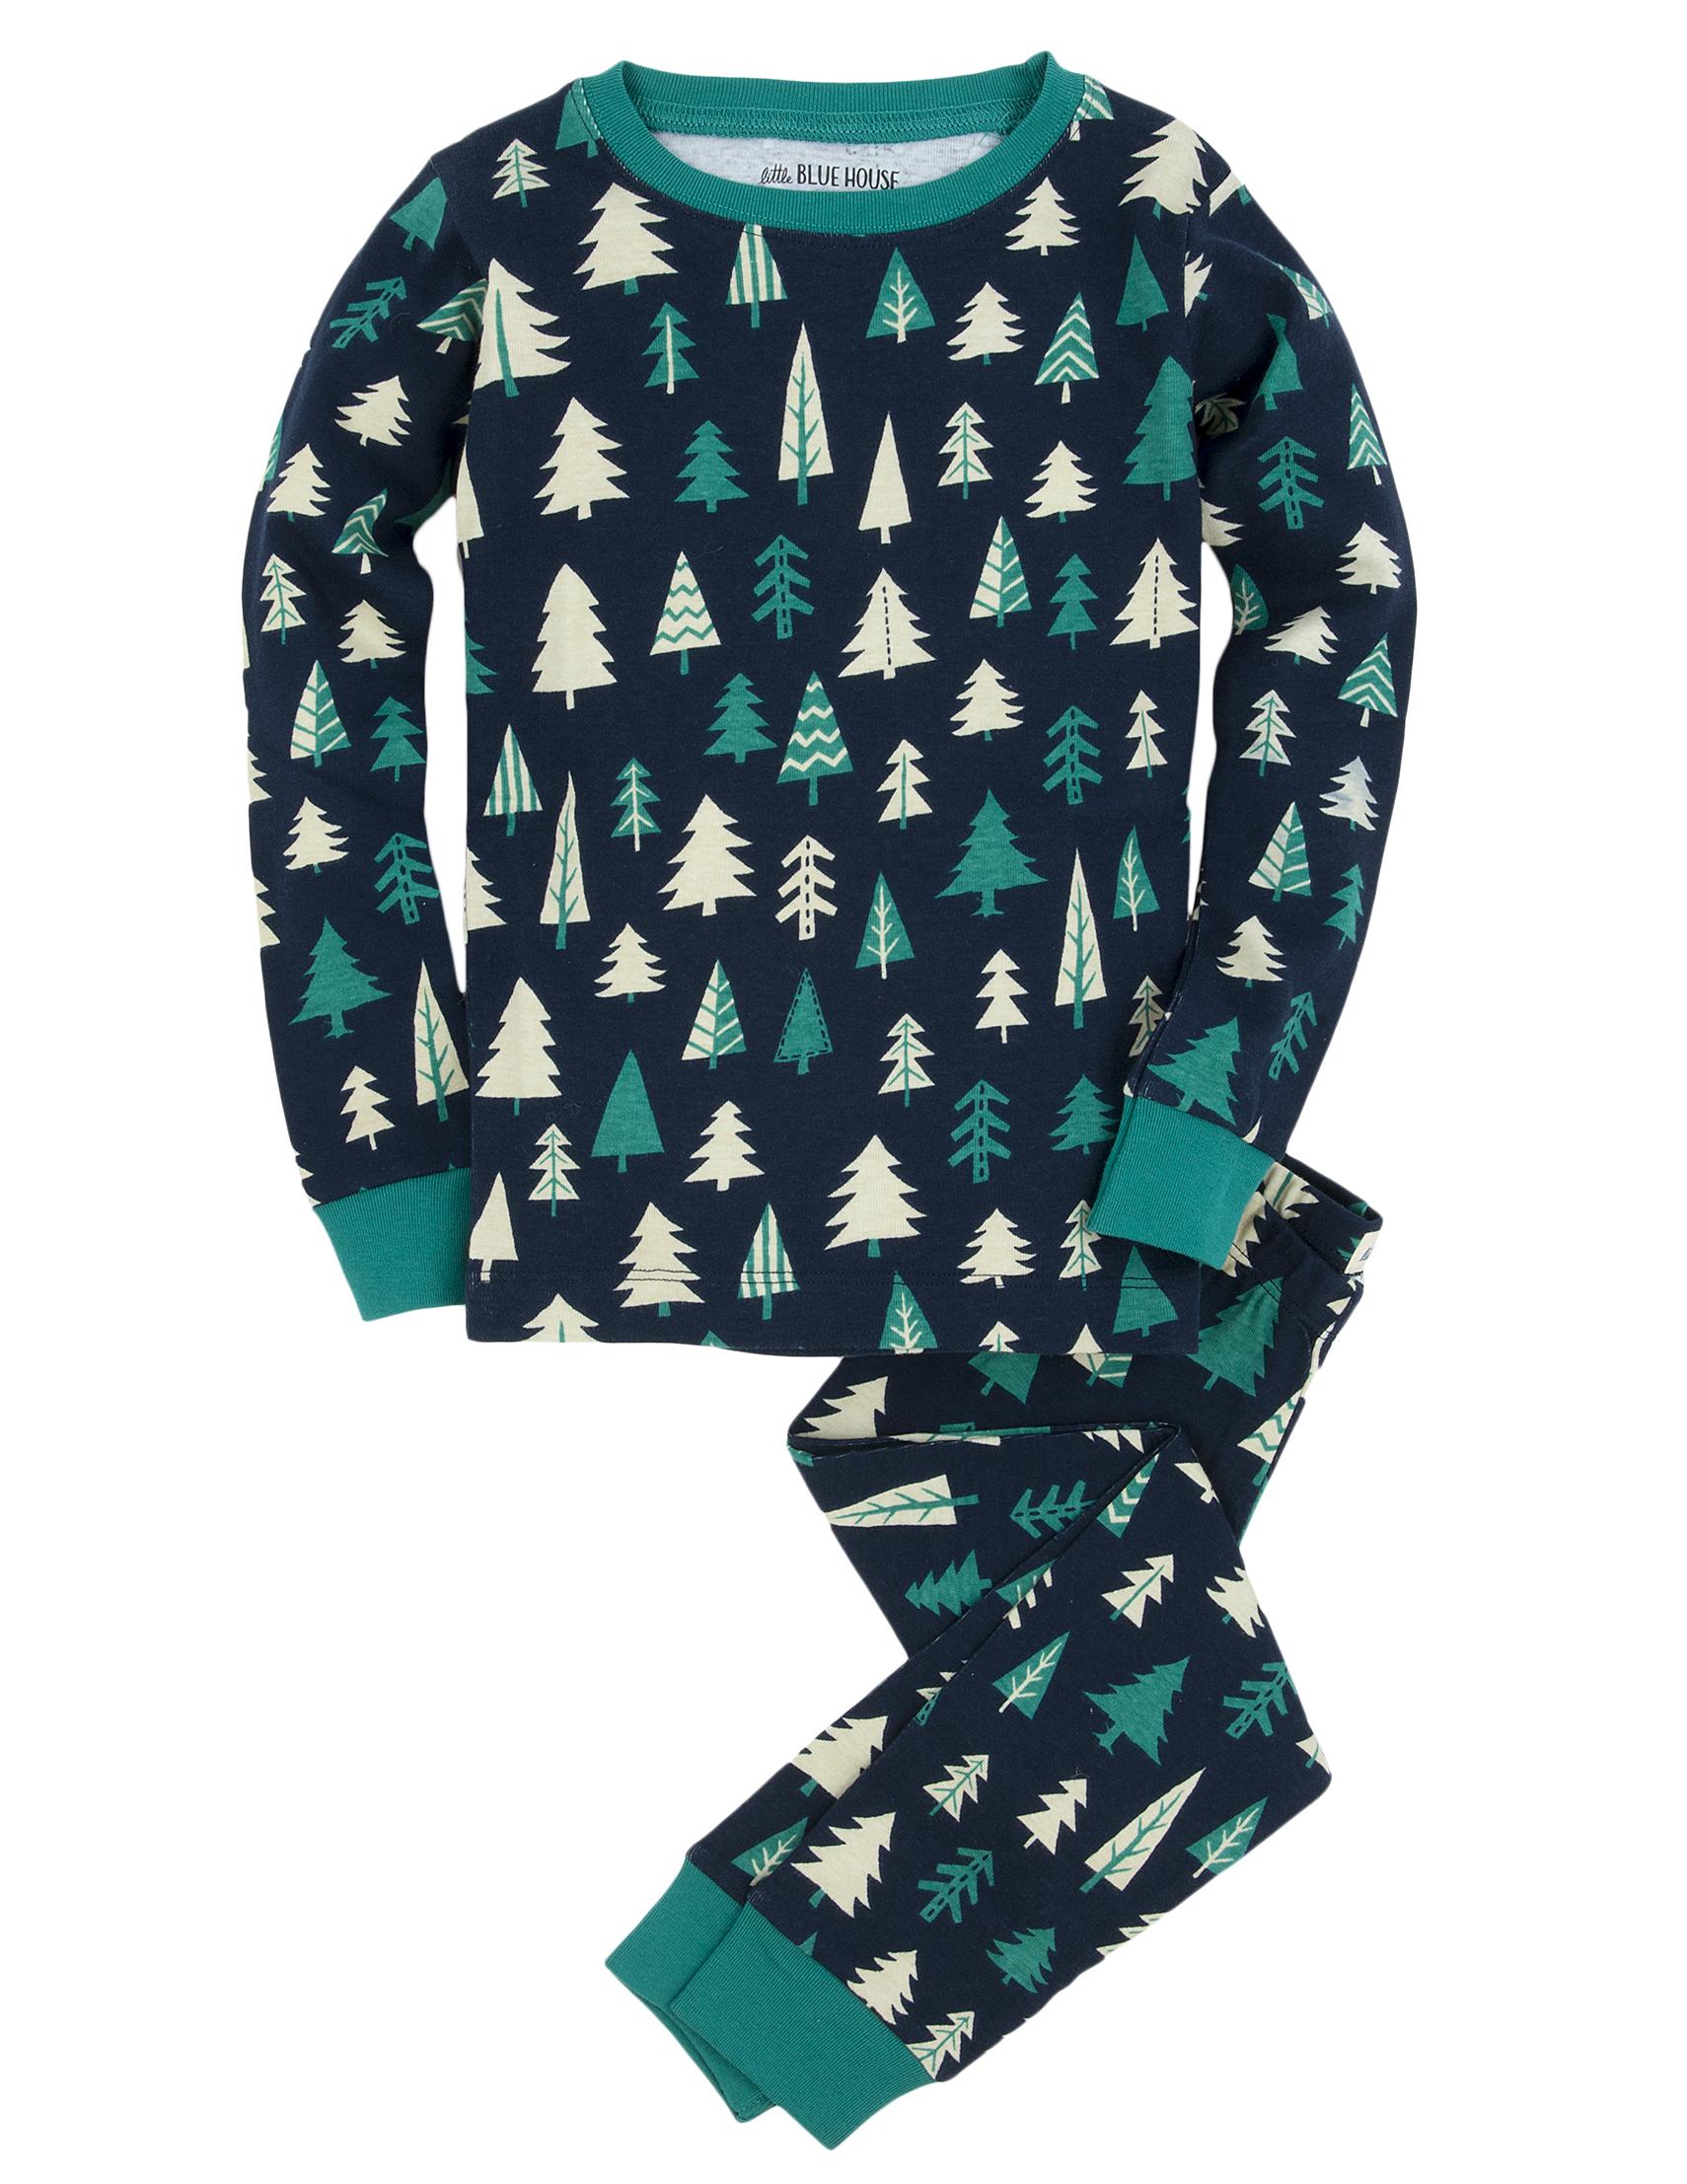 Hatley Christmas PJs